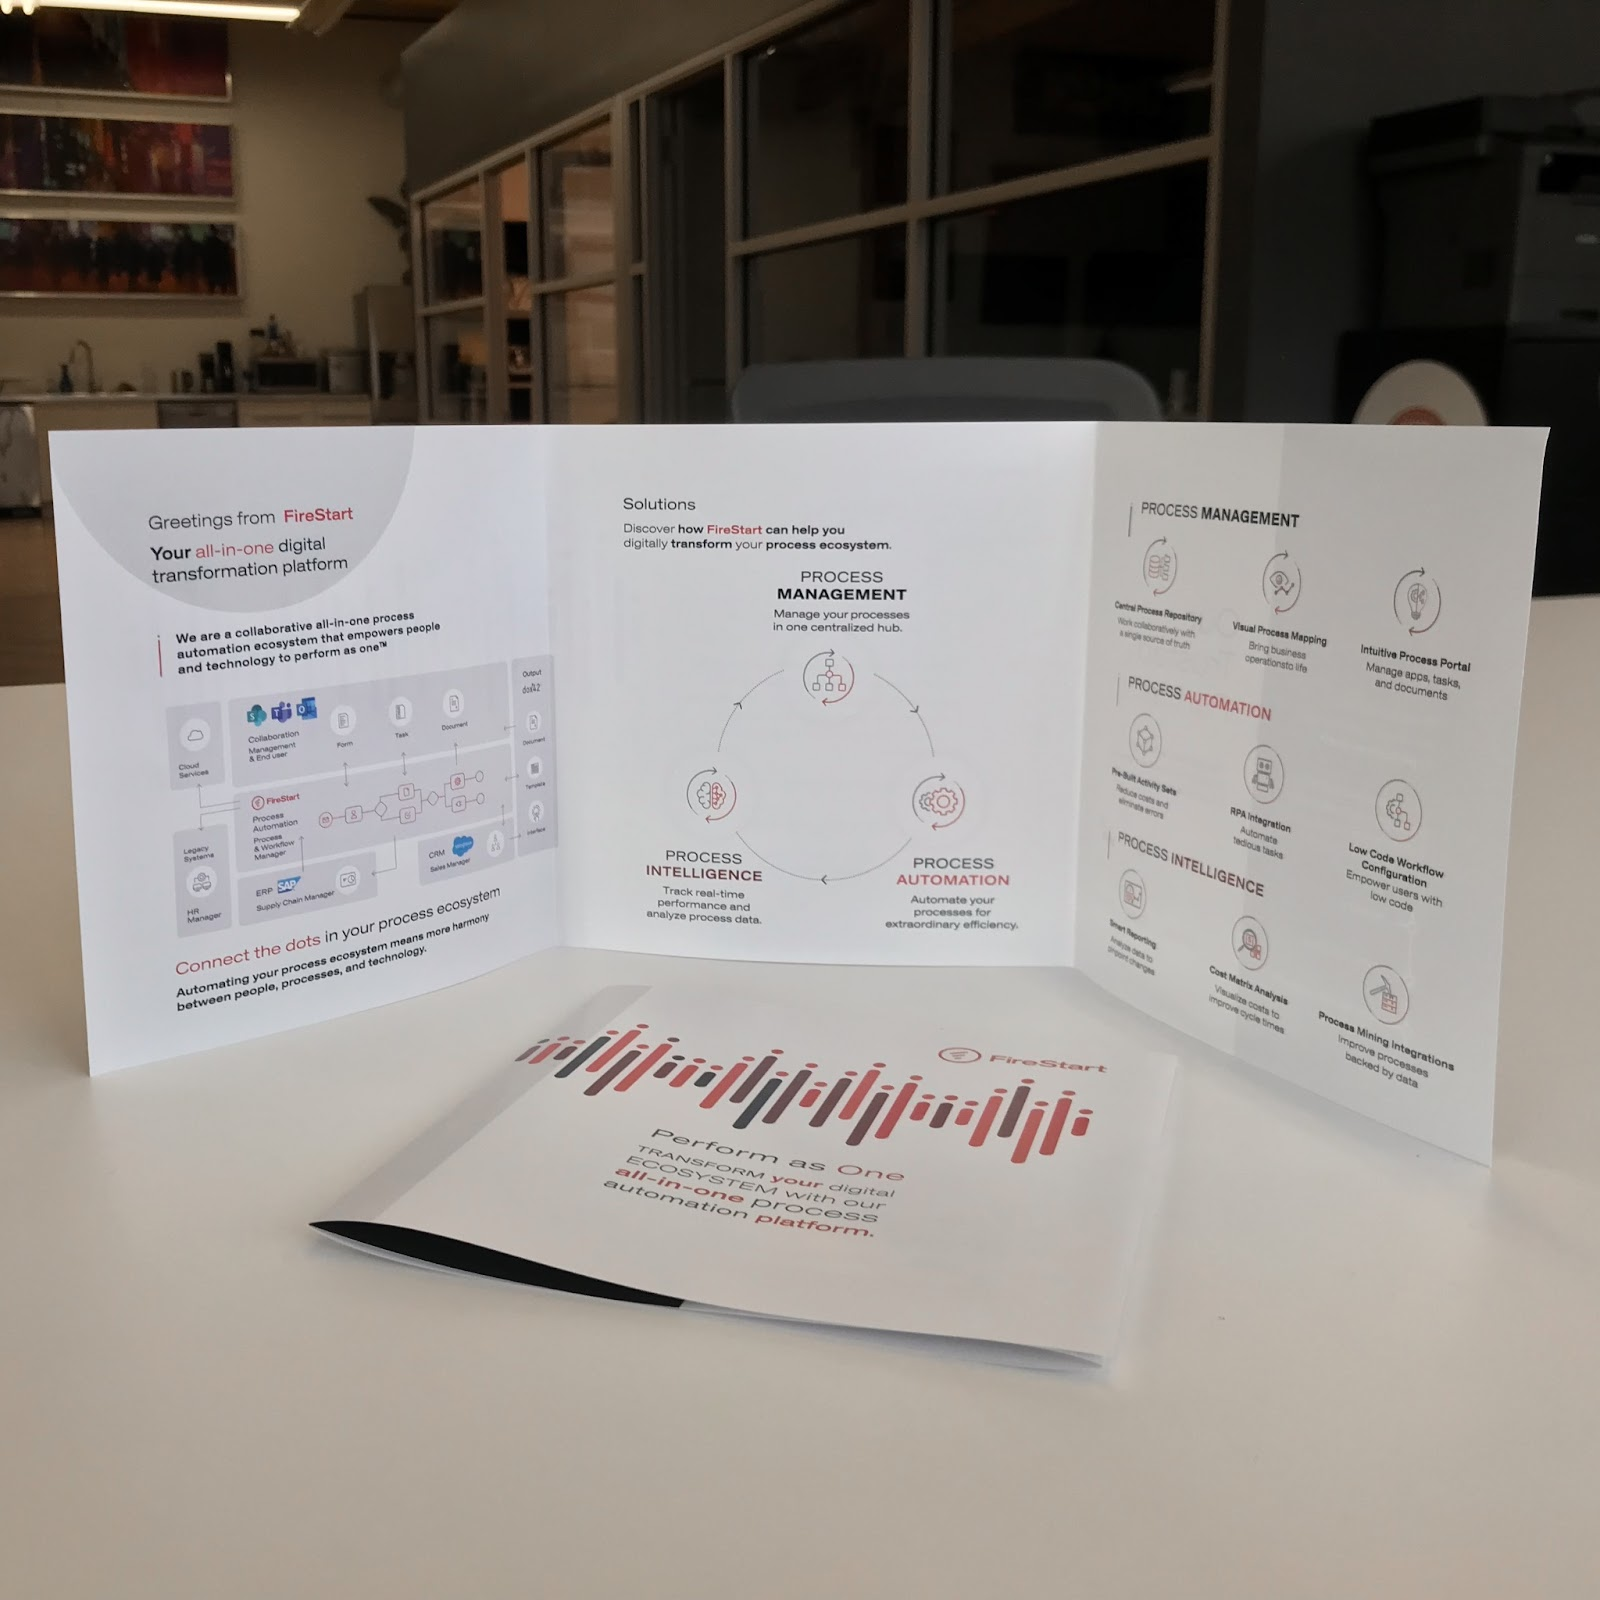 Image of tri fold brochure from FireStart.